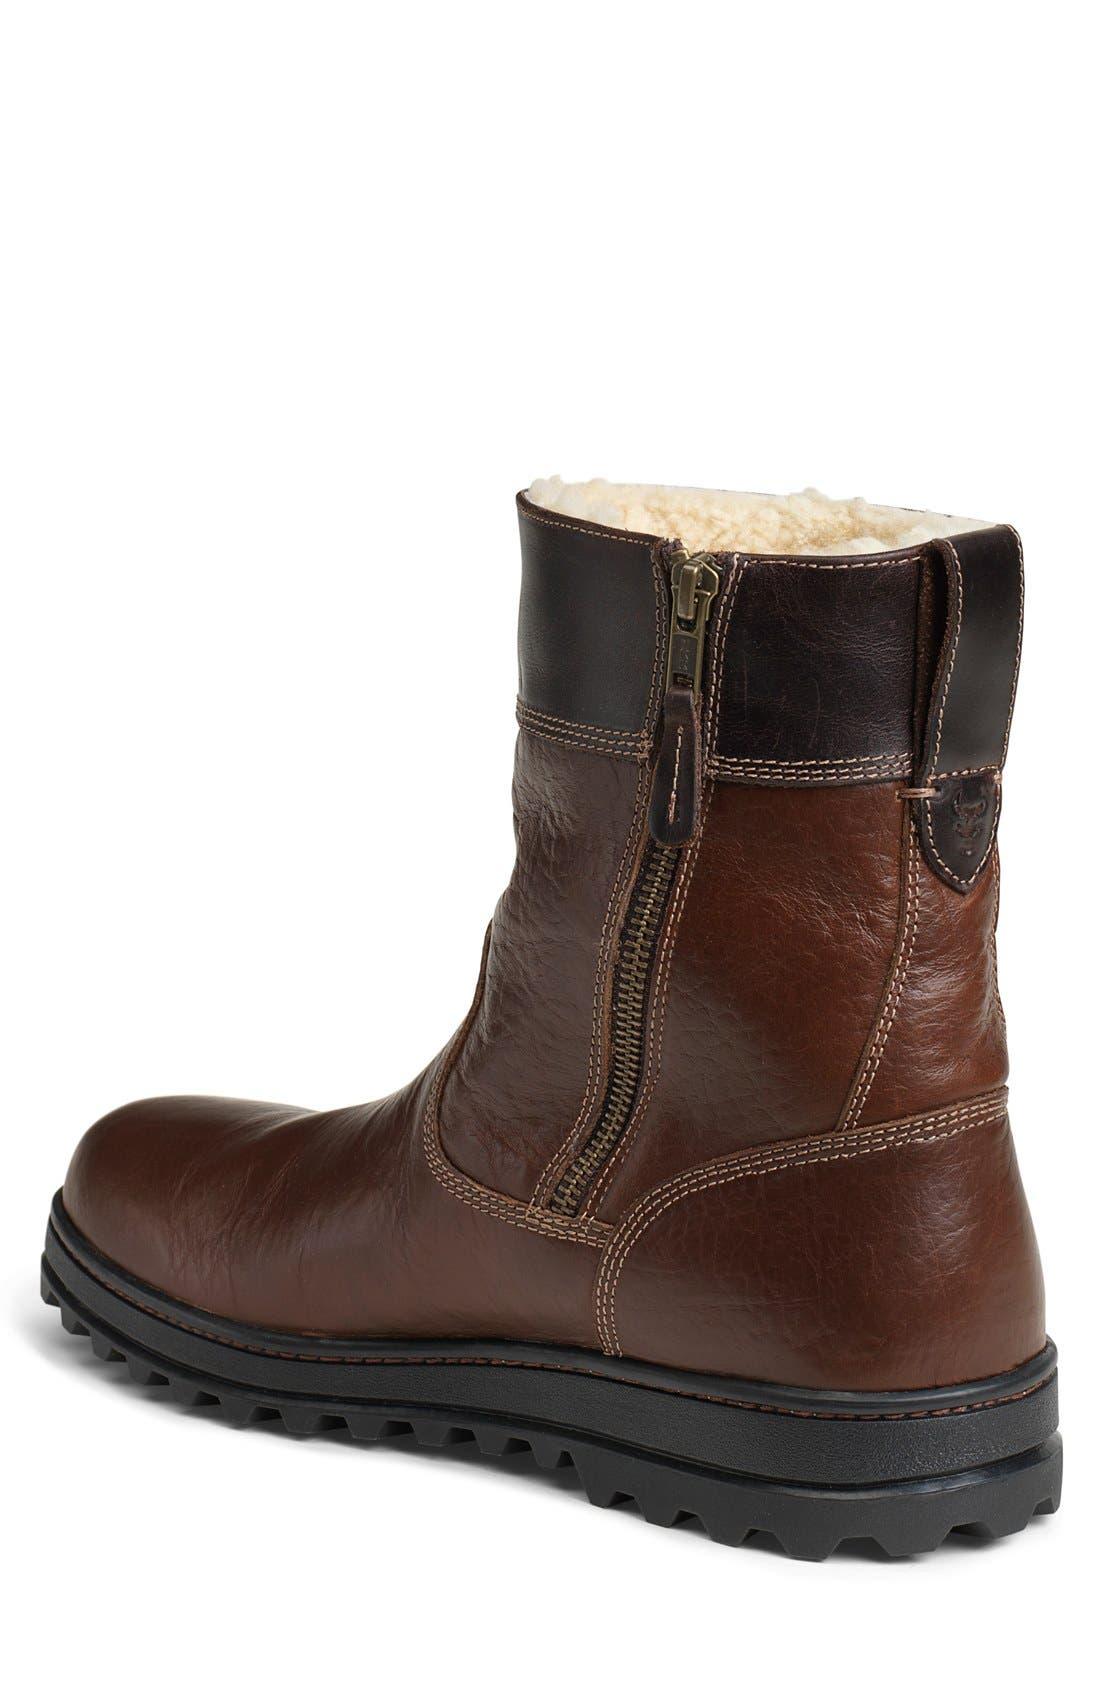 Alternate Image 2  - Trask 'Winslow' Plain Toe Boot (Men)